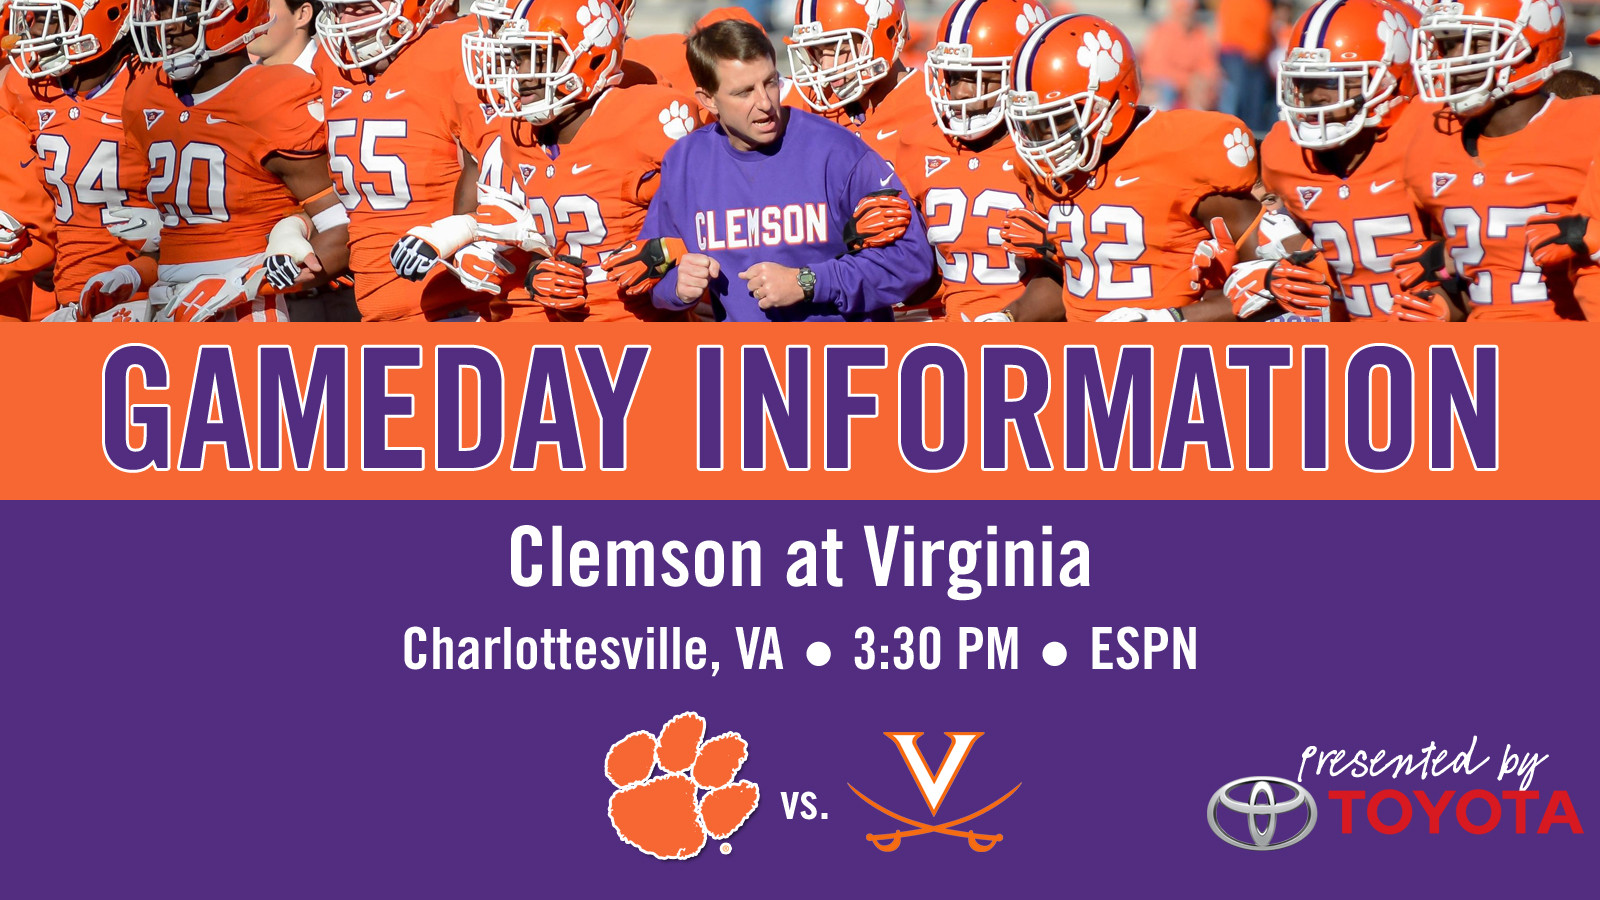 Clemson @ Virginia Football Gameday Information